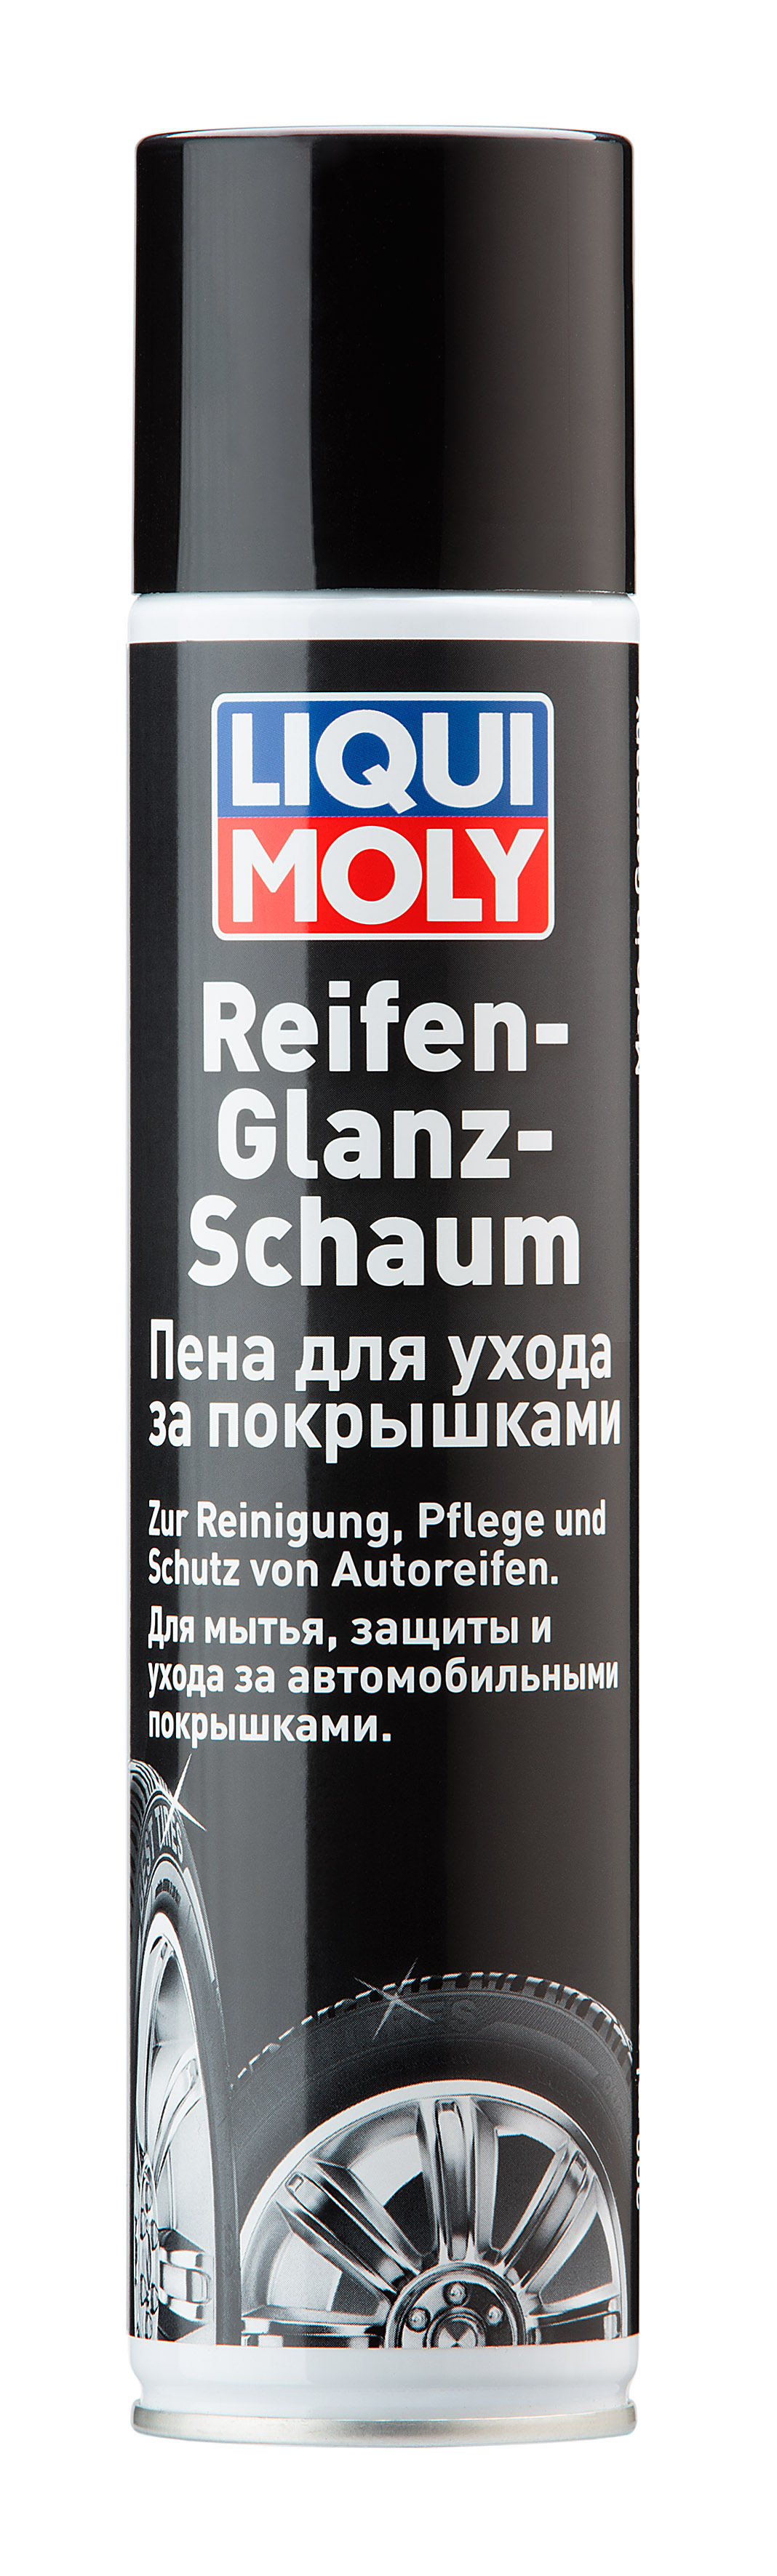 Пена для ухода за покрышками Reifen-Glanz-Schaum